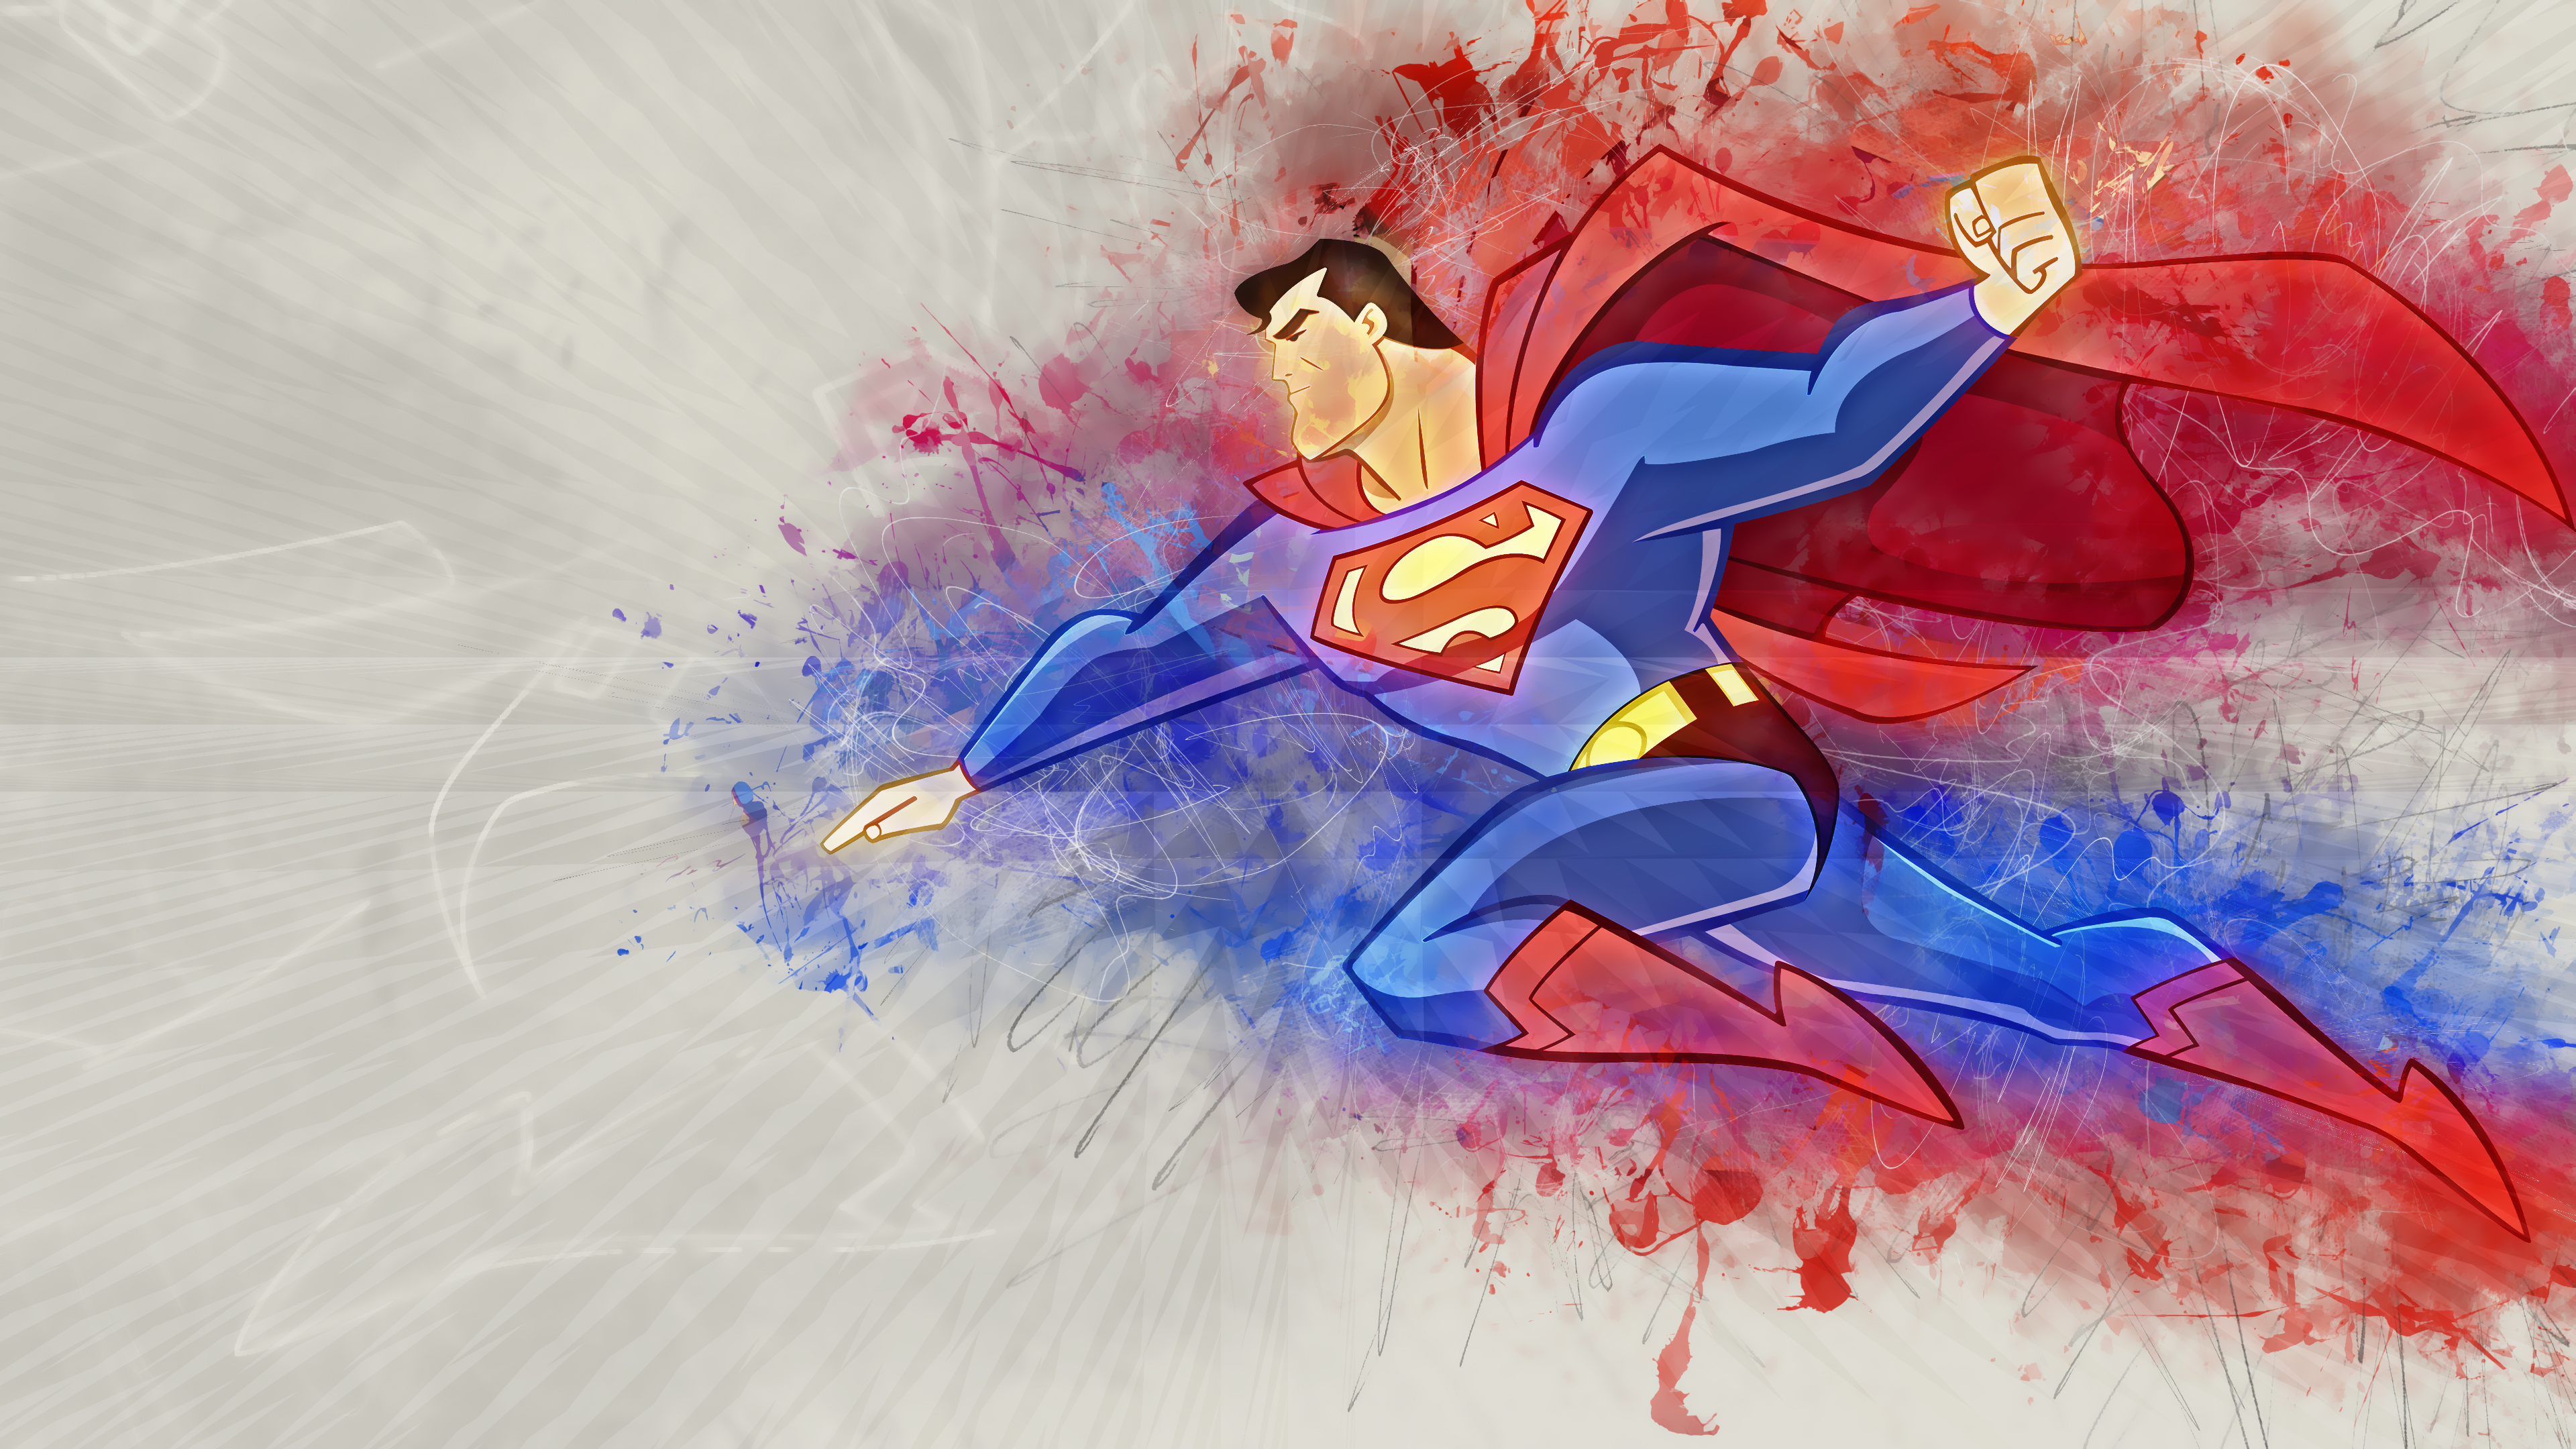 superman artwork 4k 1536521965 - Superman Artwork 4k - superman wallpapers, superheroes wallpapers, hd-wallpapers, digital art wallpapers, artwork wallpapers, 4k-wallpapers